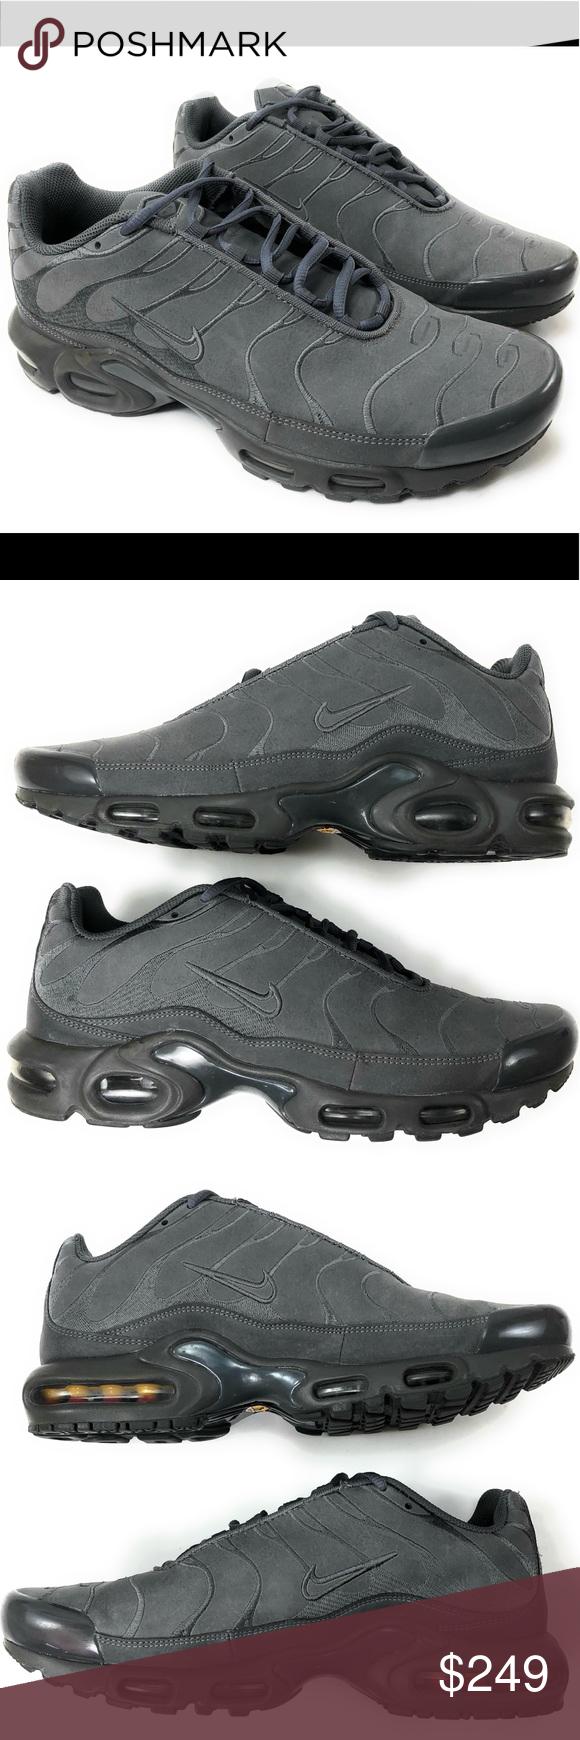 once Aturdir Helecho  Nike Air Max Plus TN 10.5 Premium Leather 558571 | Nike air max plus, Air  max plus, Nike air max